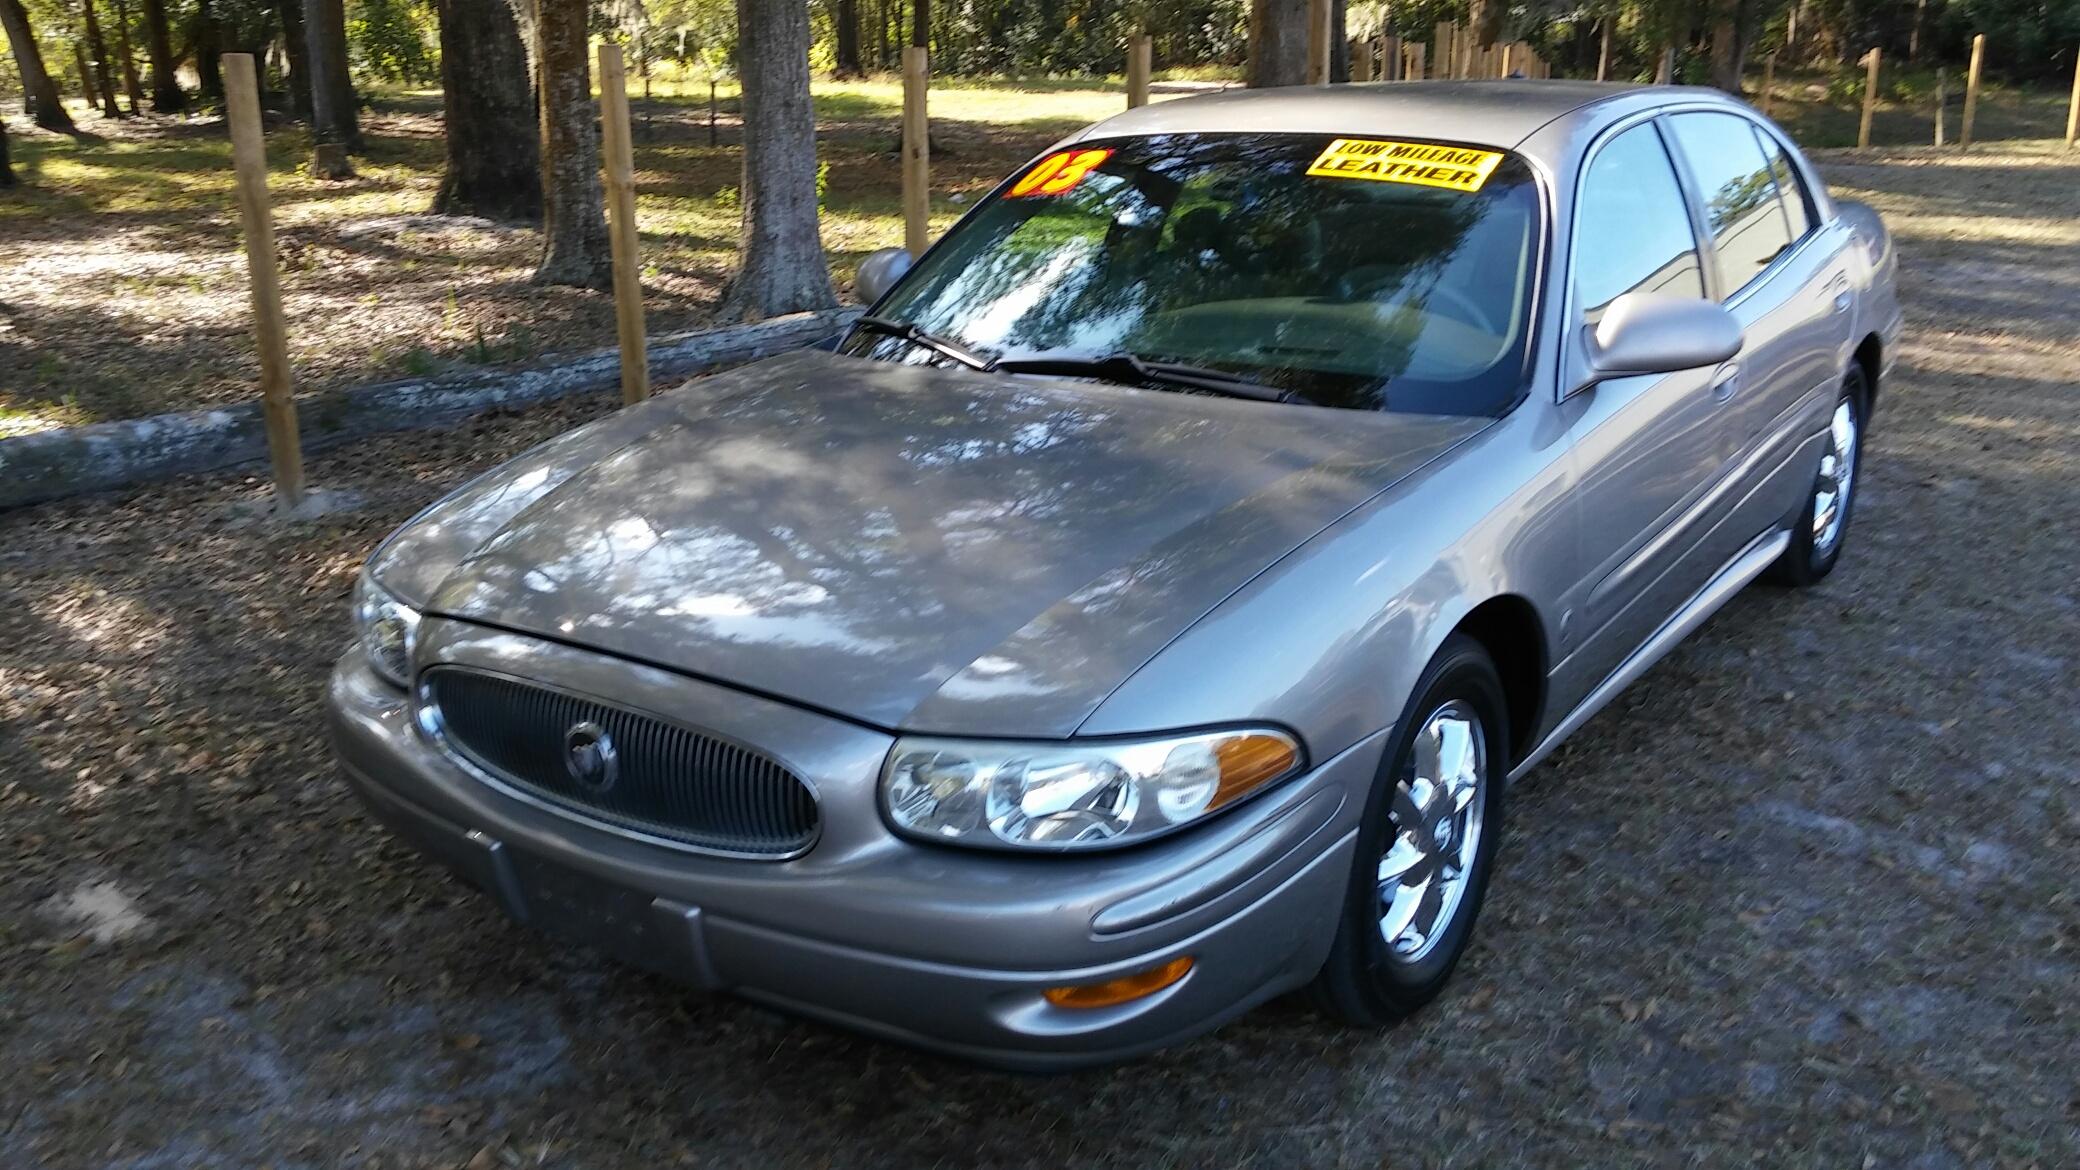 2003 Buick Lesabre $1,400.00 down